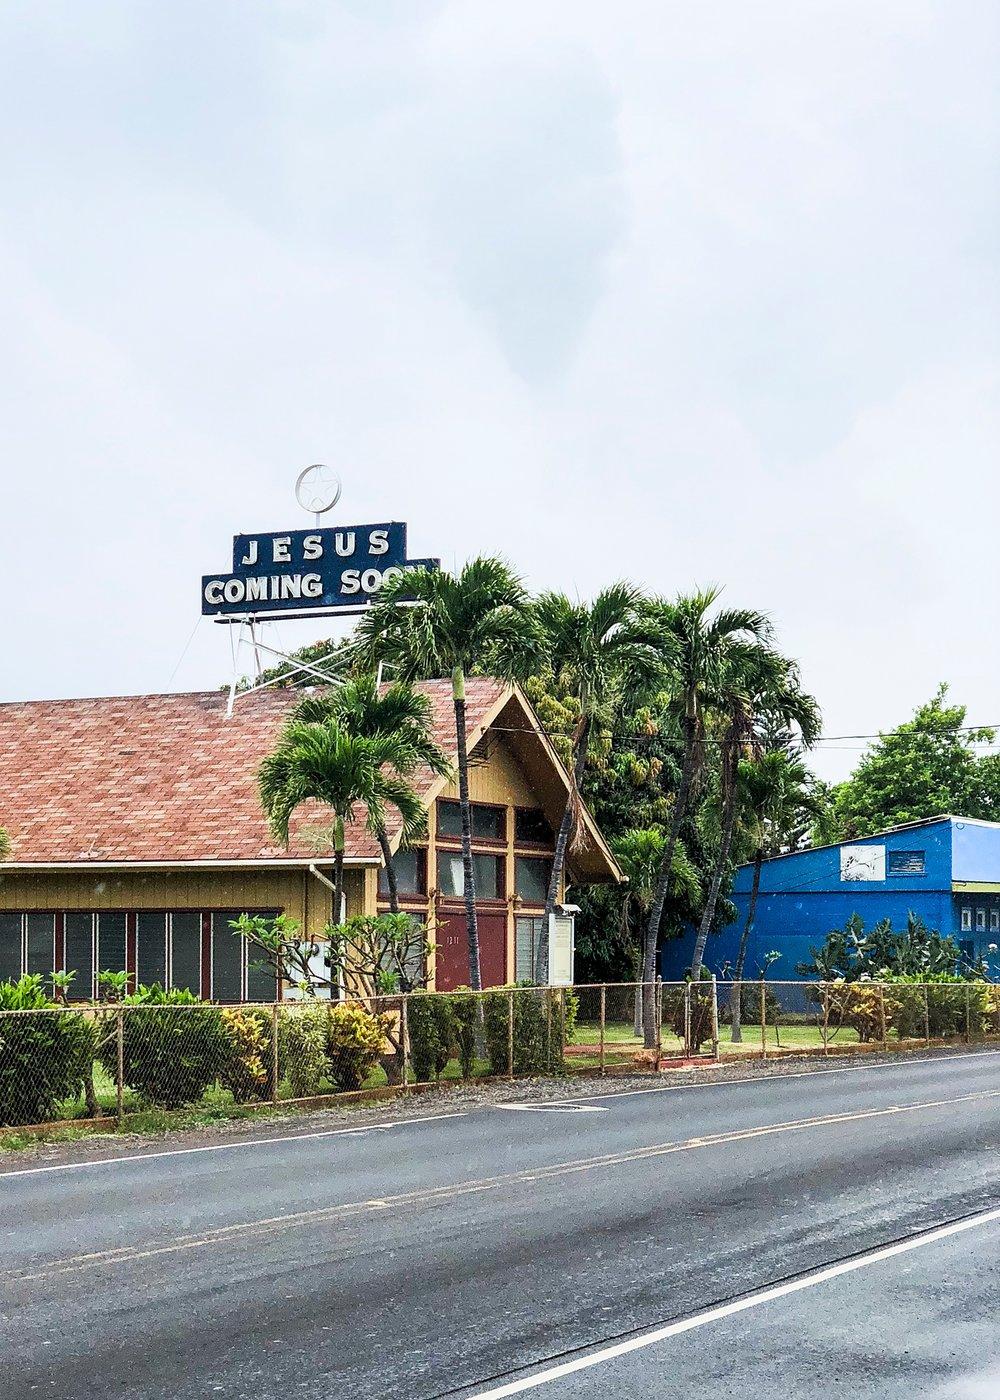 Maui-1-4.jpg